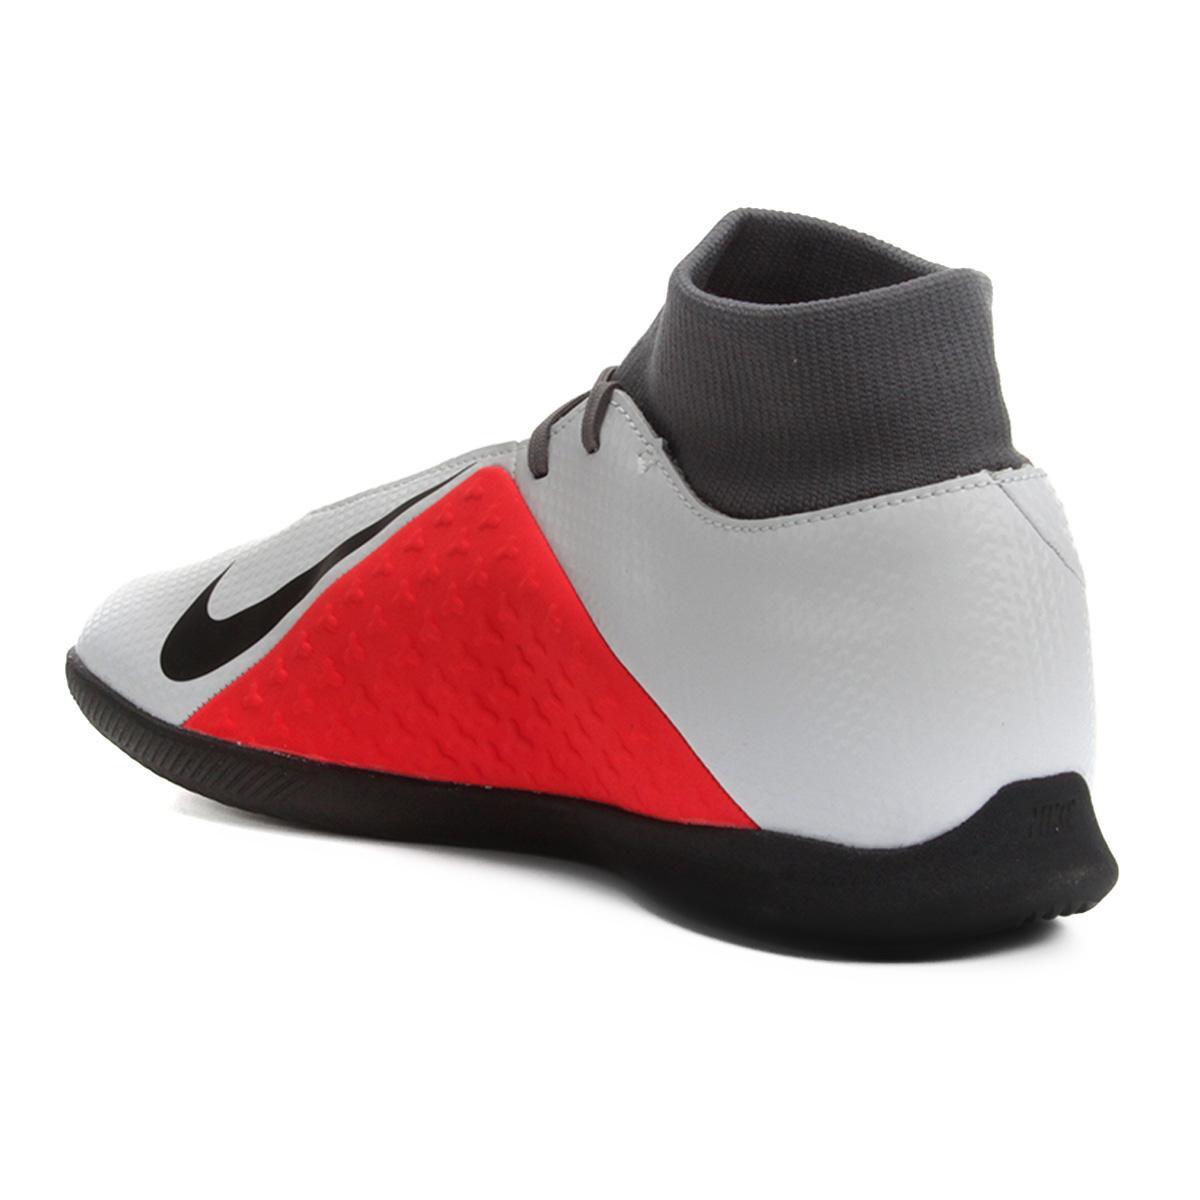 Chuteira Futsal Nike Phantom Vision Club DF IC - Cinza - Compre ... 744c7018c9642